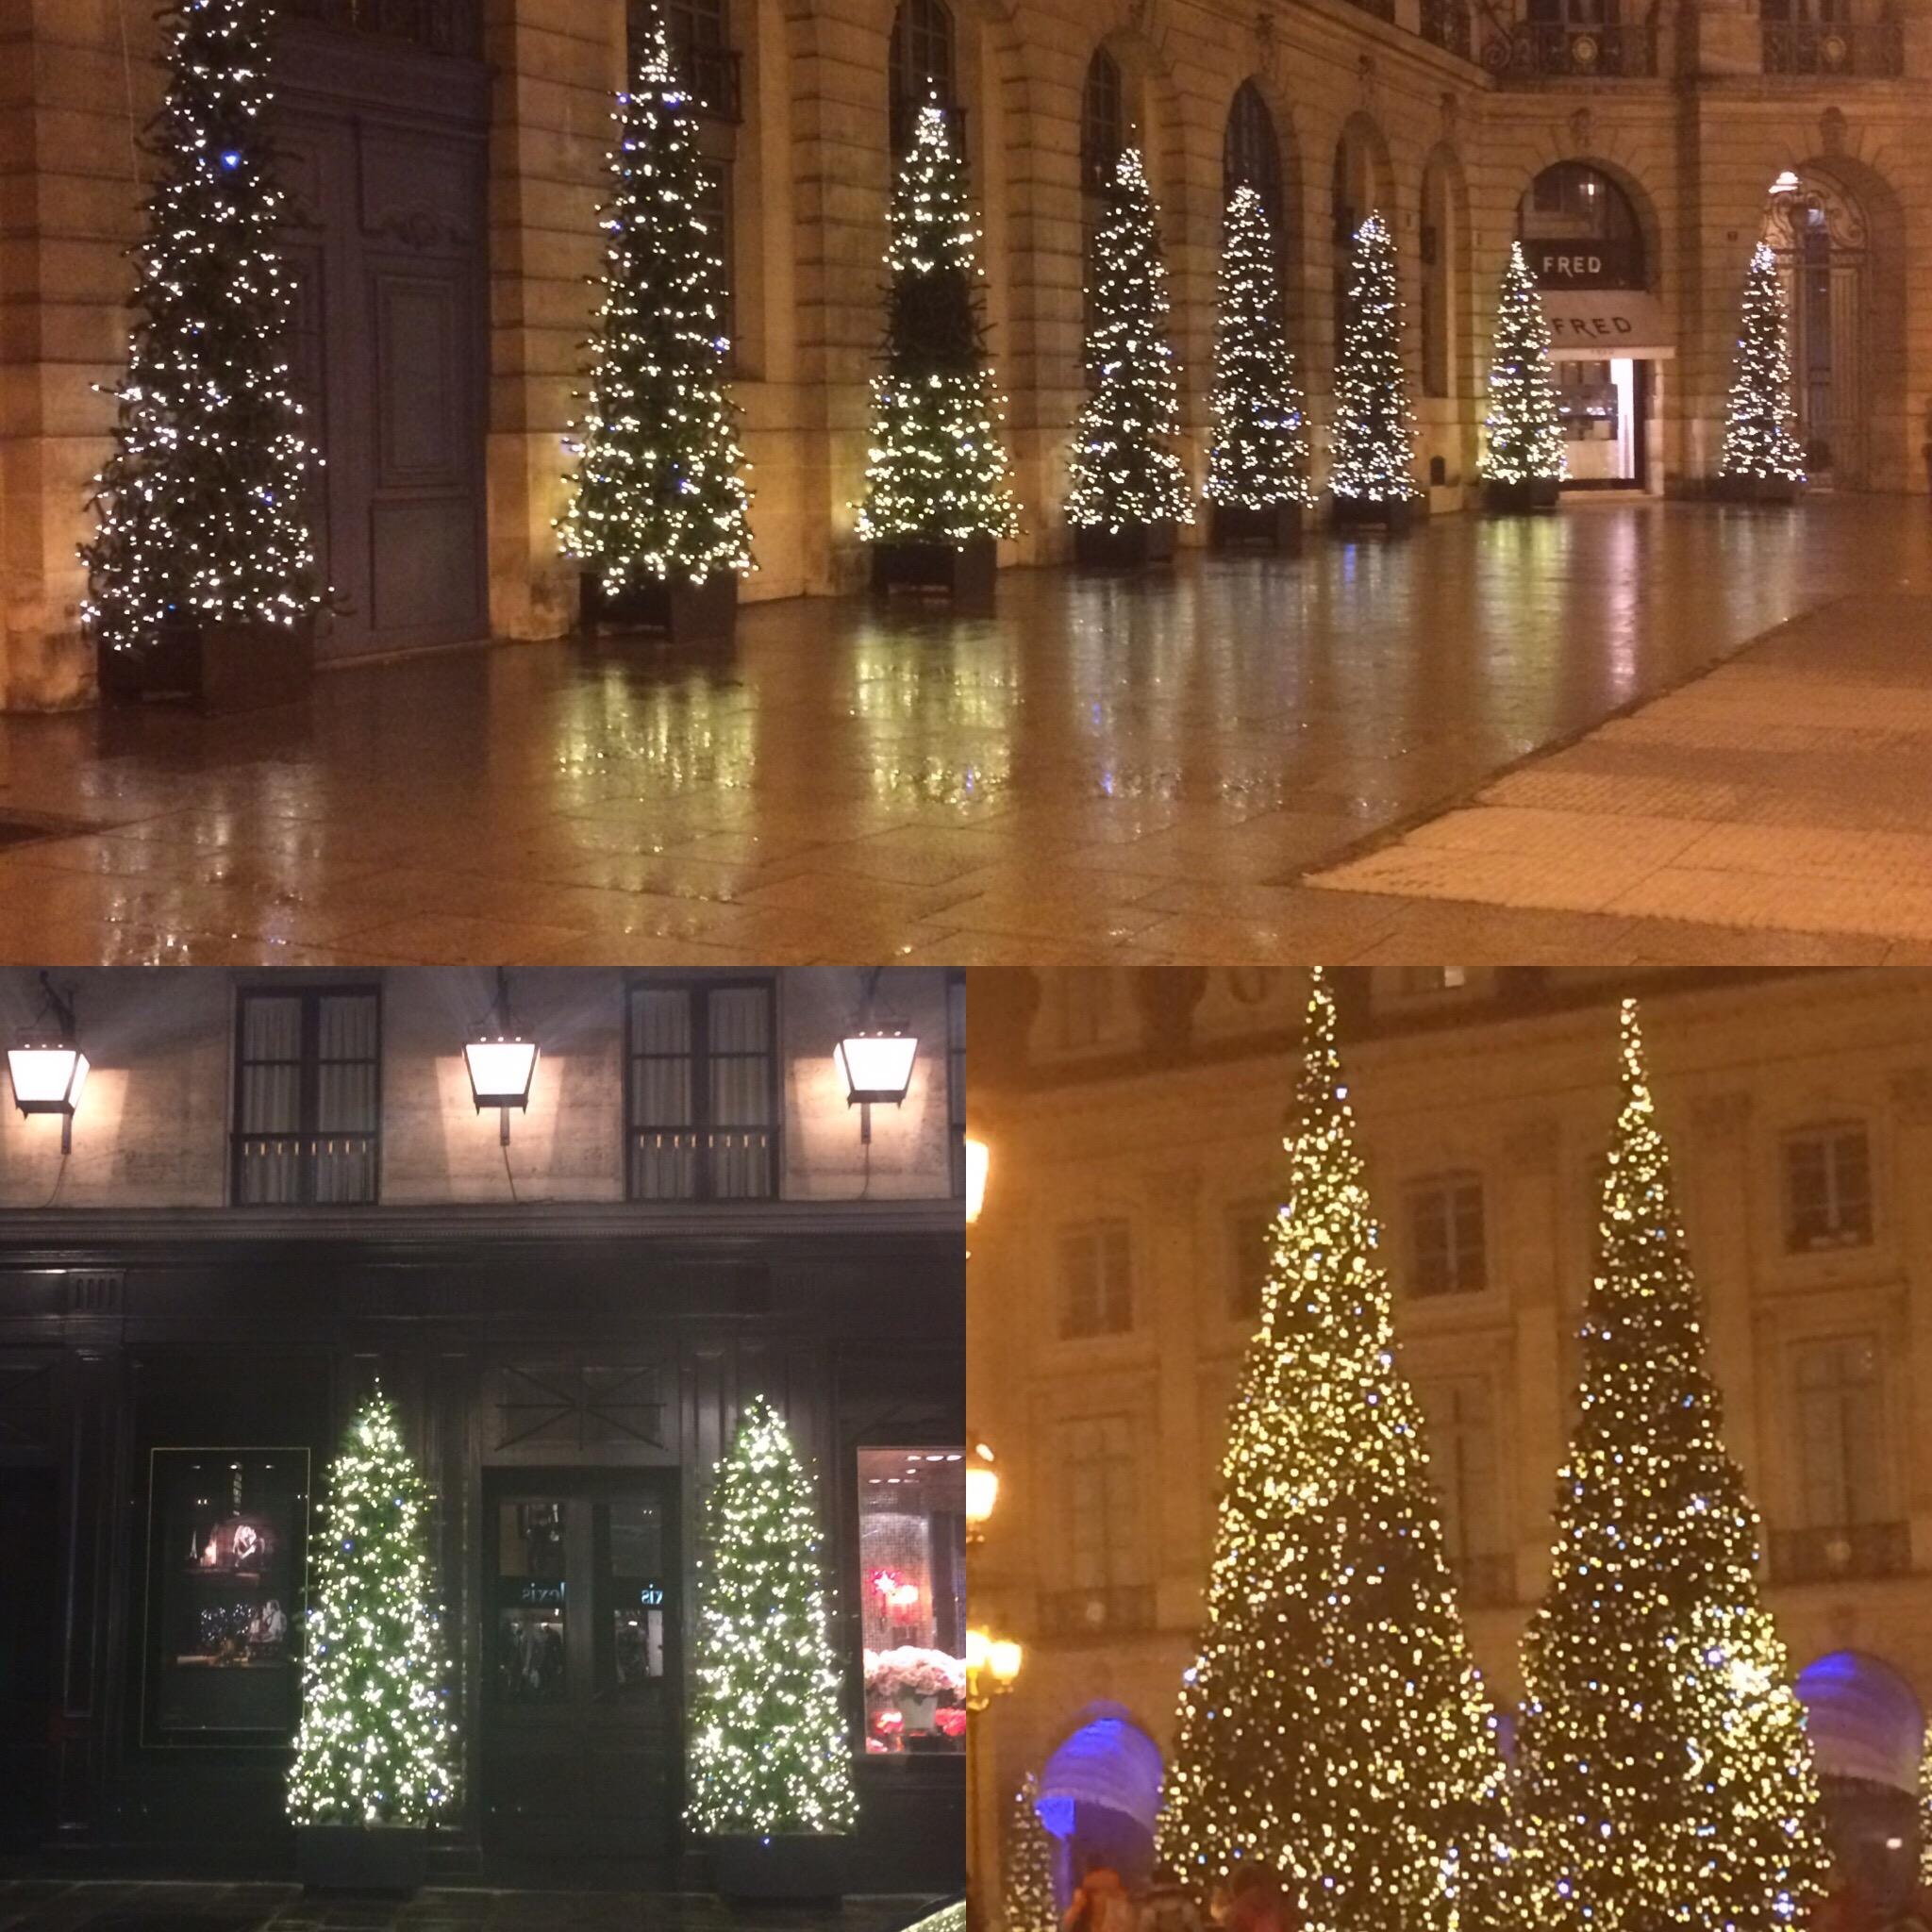 743 tags christmas decorations festival holiday christmas tree views - I Definitely